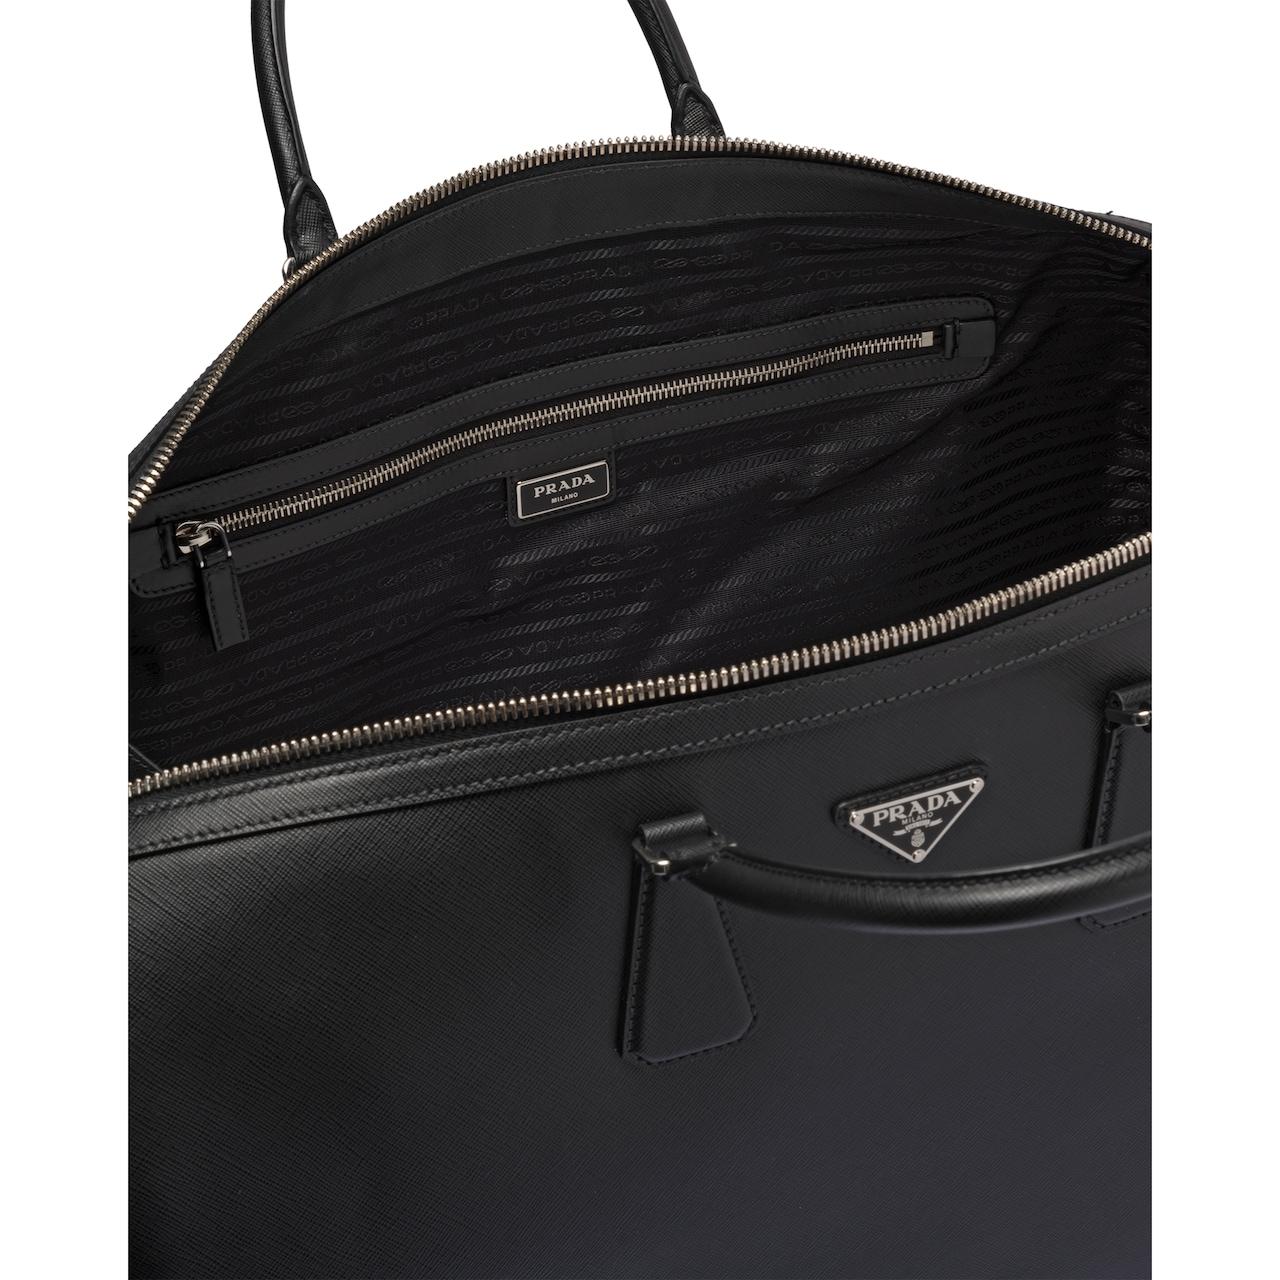 Prada Saffiano leather duffle bag 5